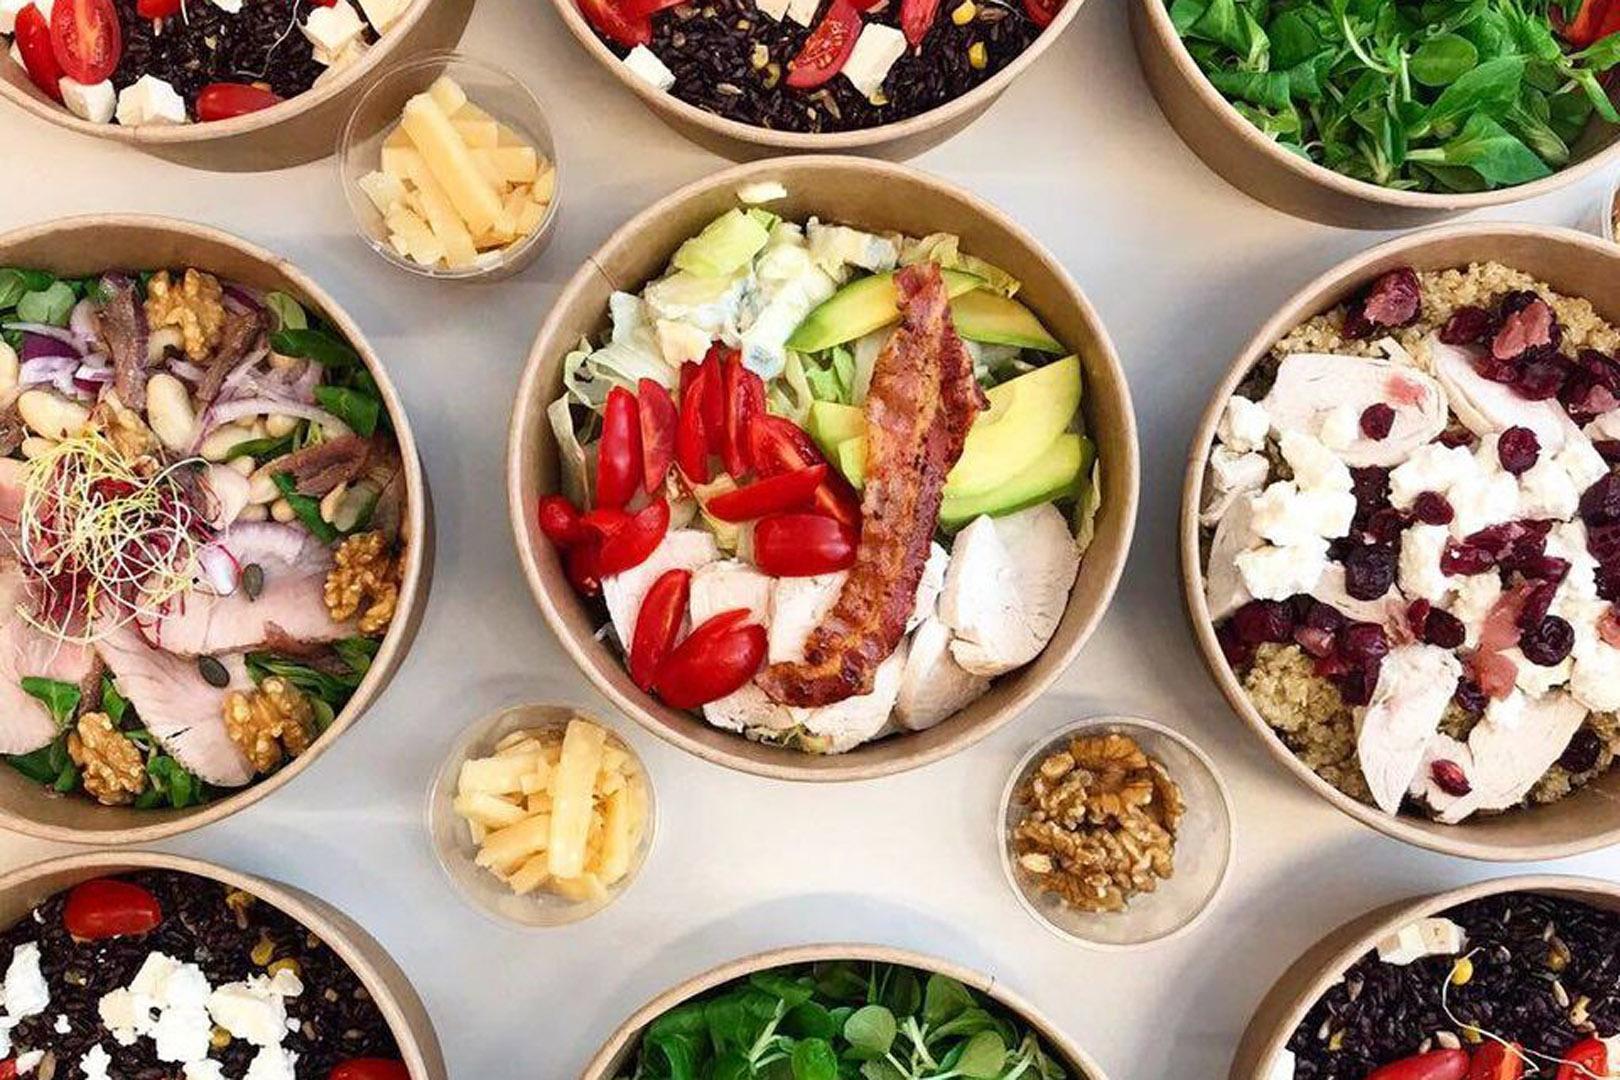 Healthy Food Milano Consegna a Domicilio